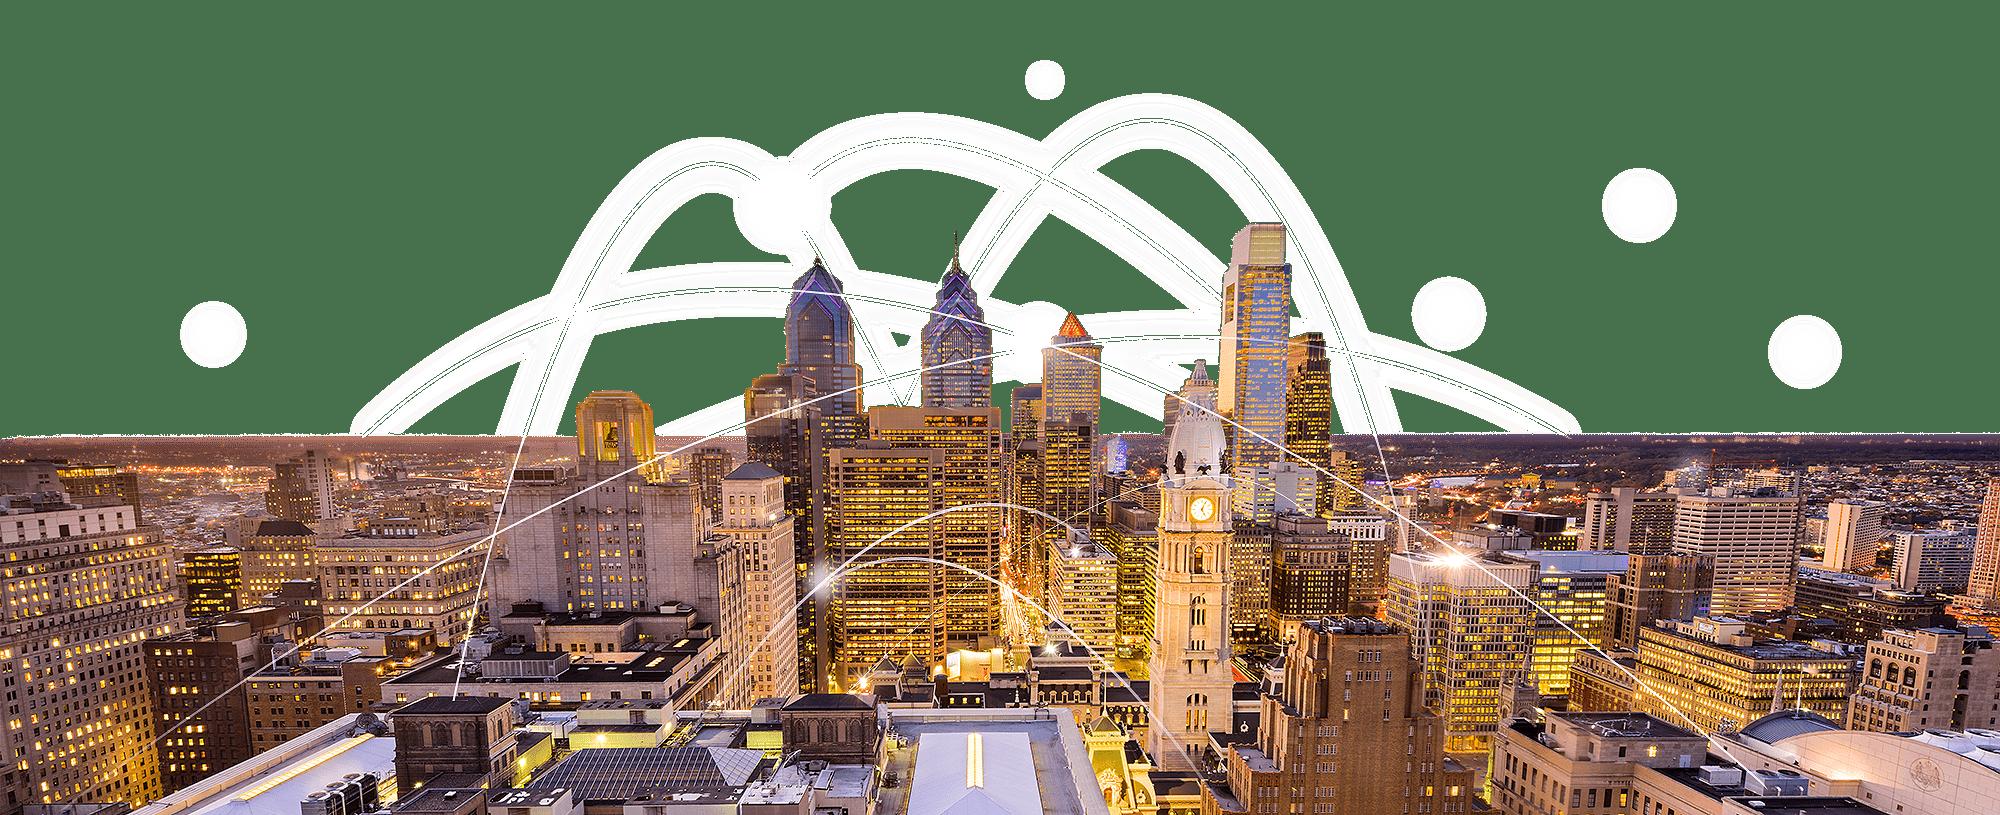 Depiction of a modern city